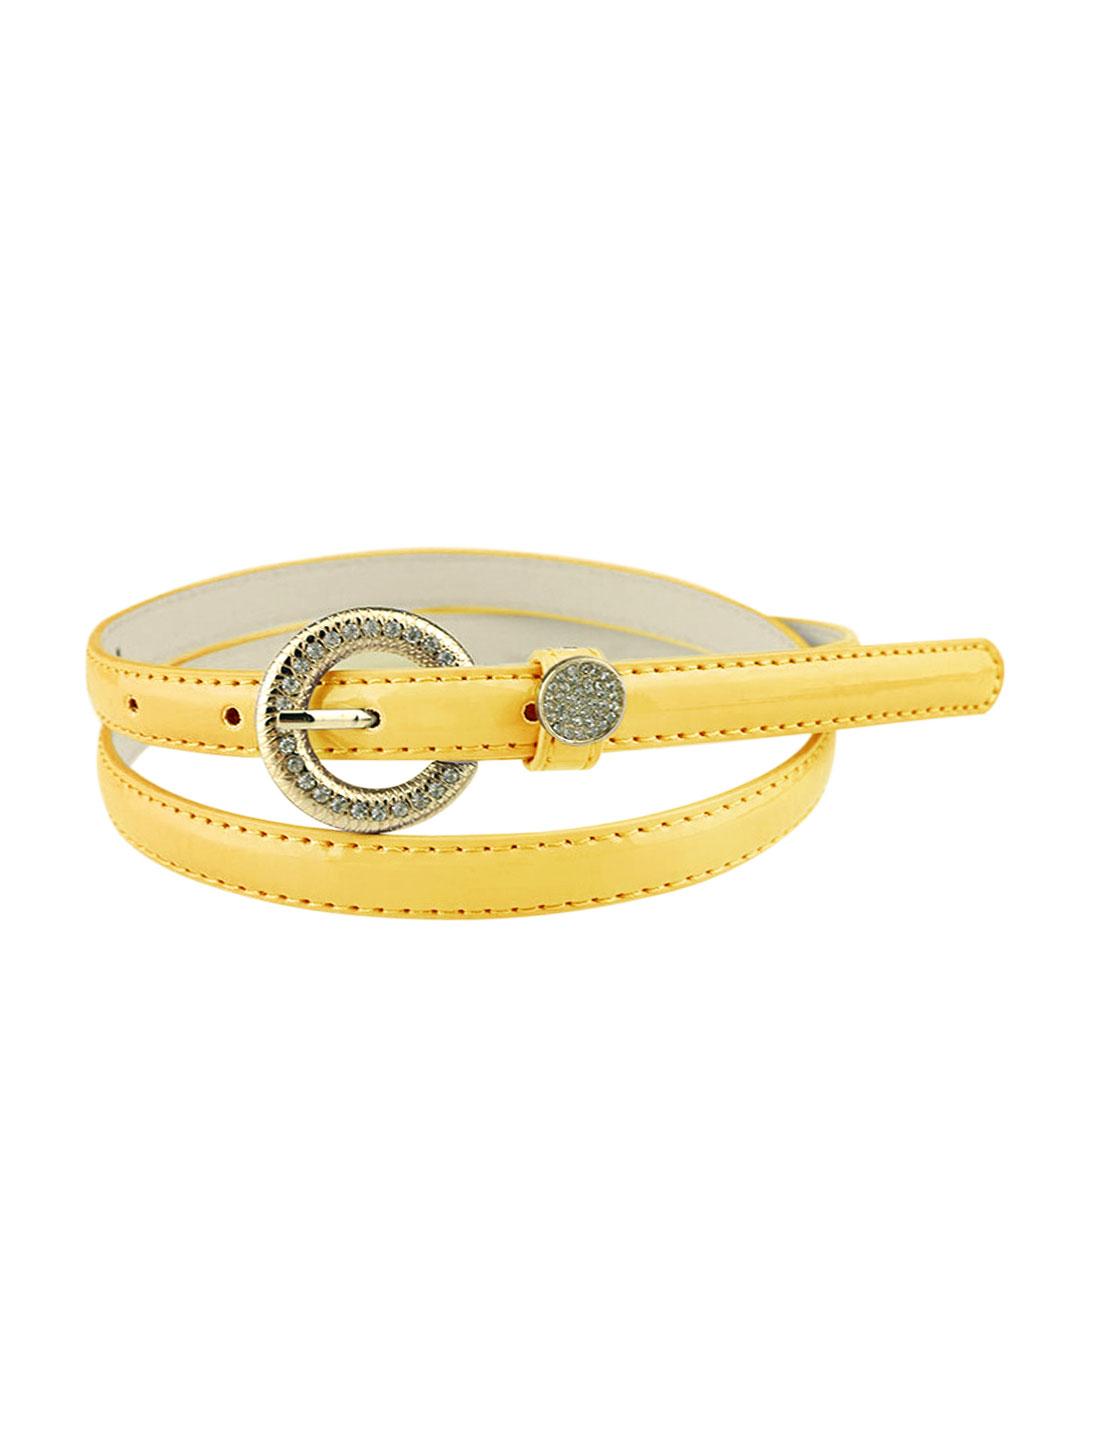 Women Rhinestone Decor Single Pin Buckle Waist Belt Yellow